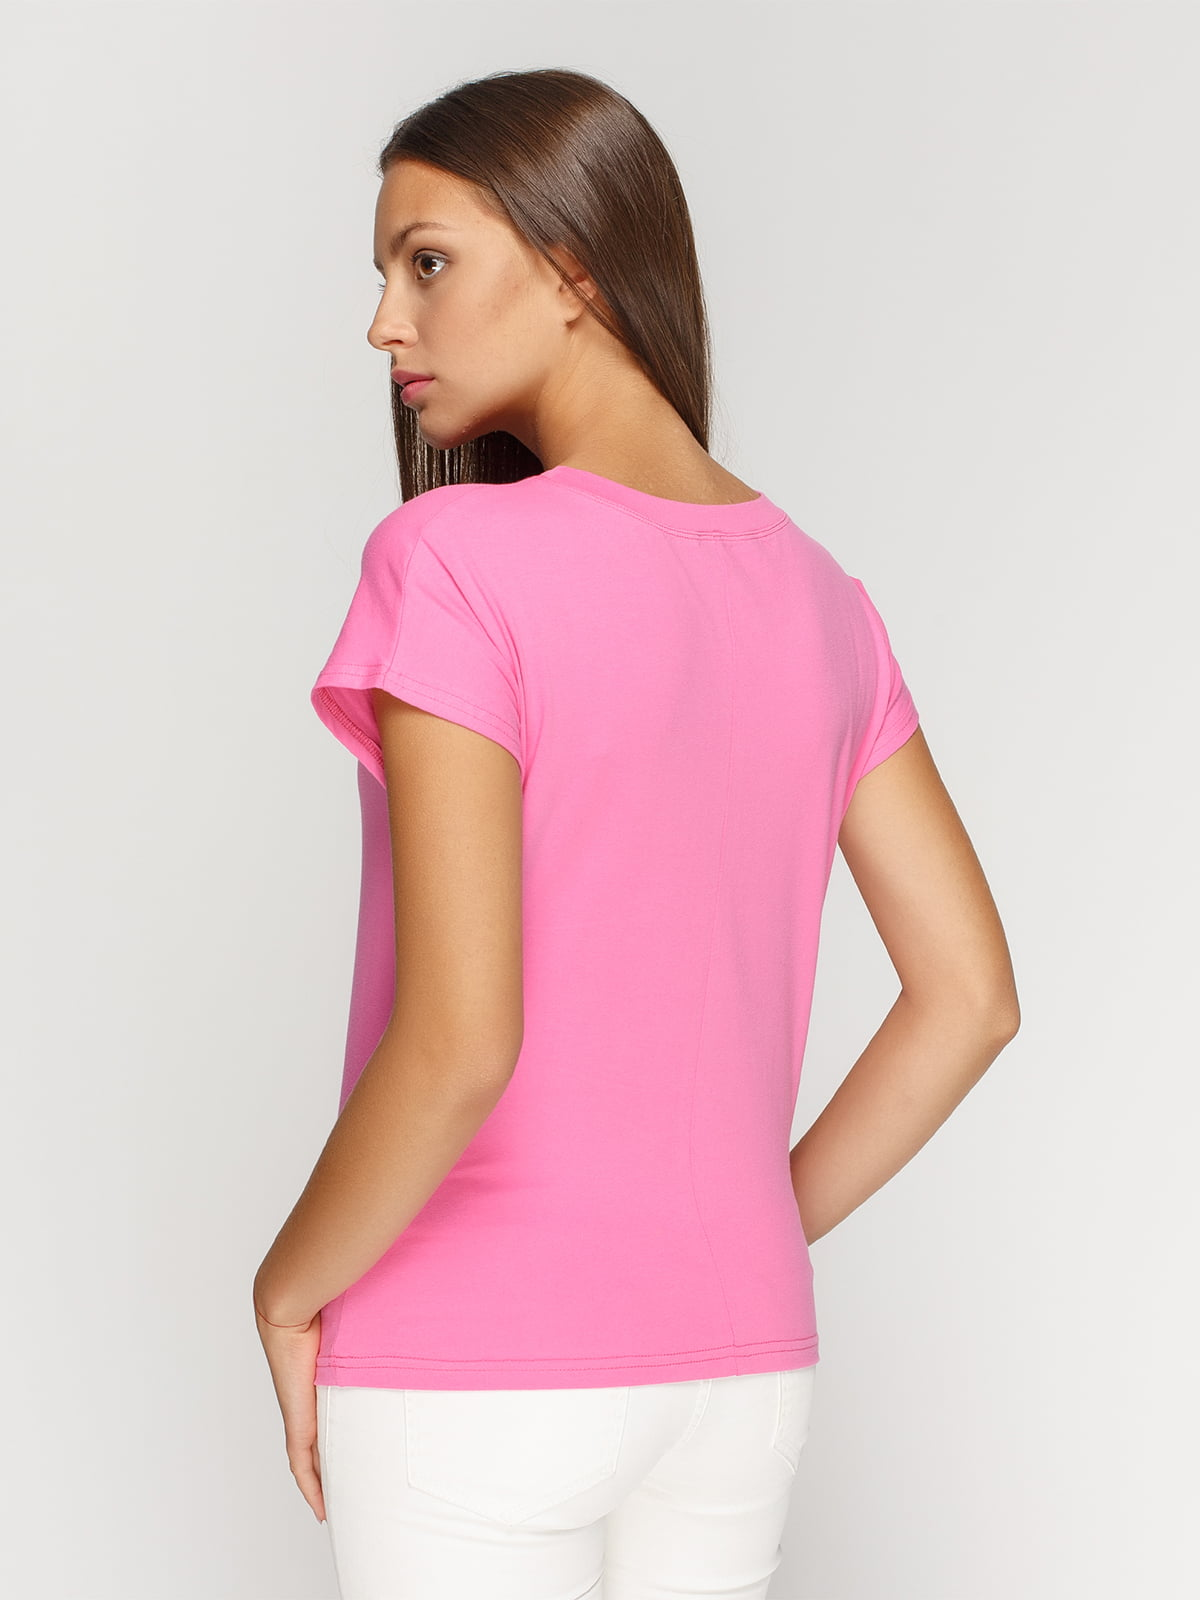 Футболка рожева з принтом | 4578123 | фото 2